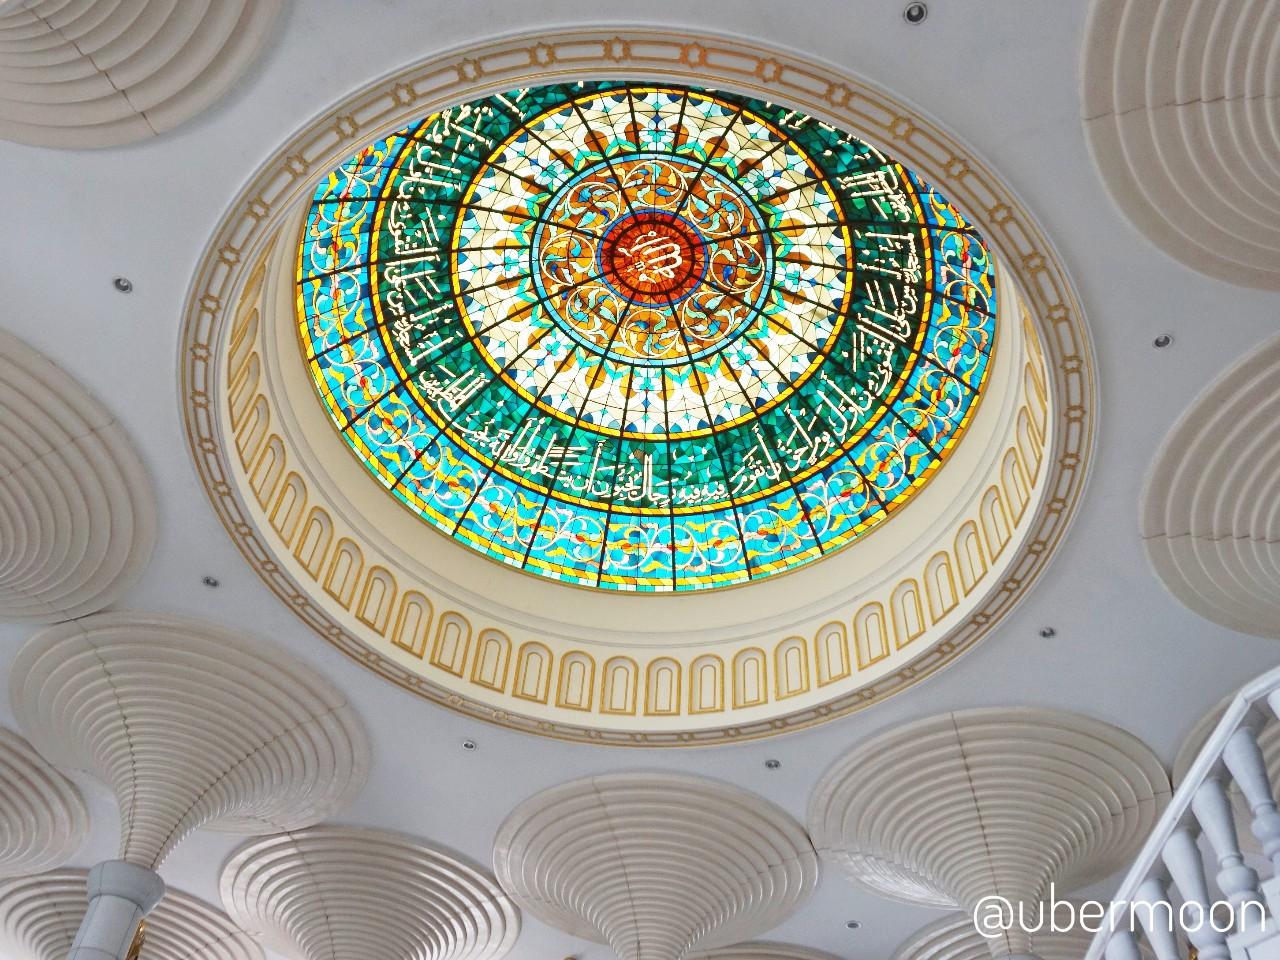 Kubah lantai bawah Masjid Jame's Asr Hassanil Bolkiah